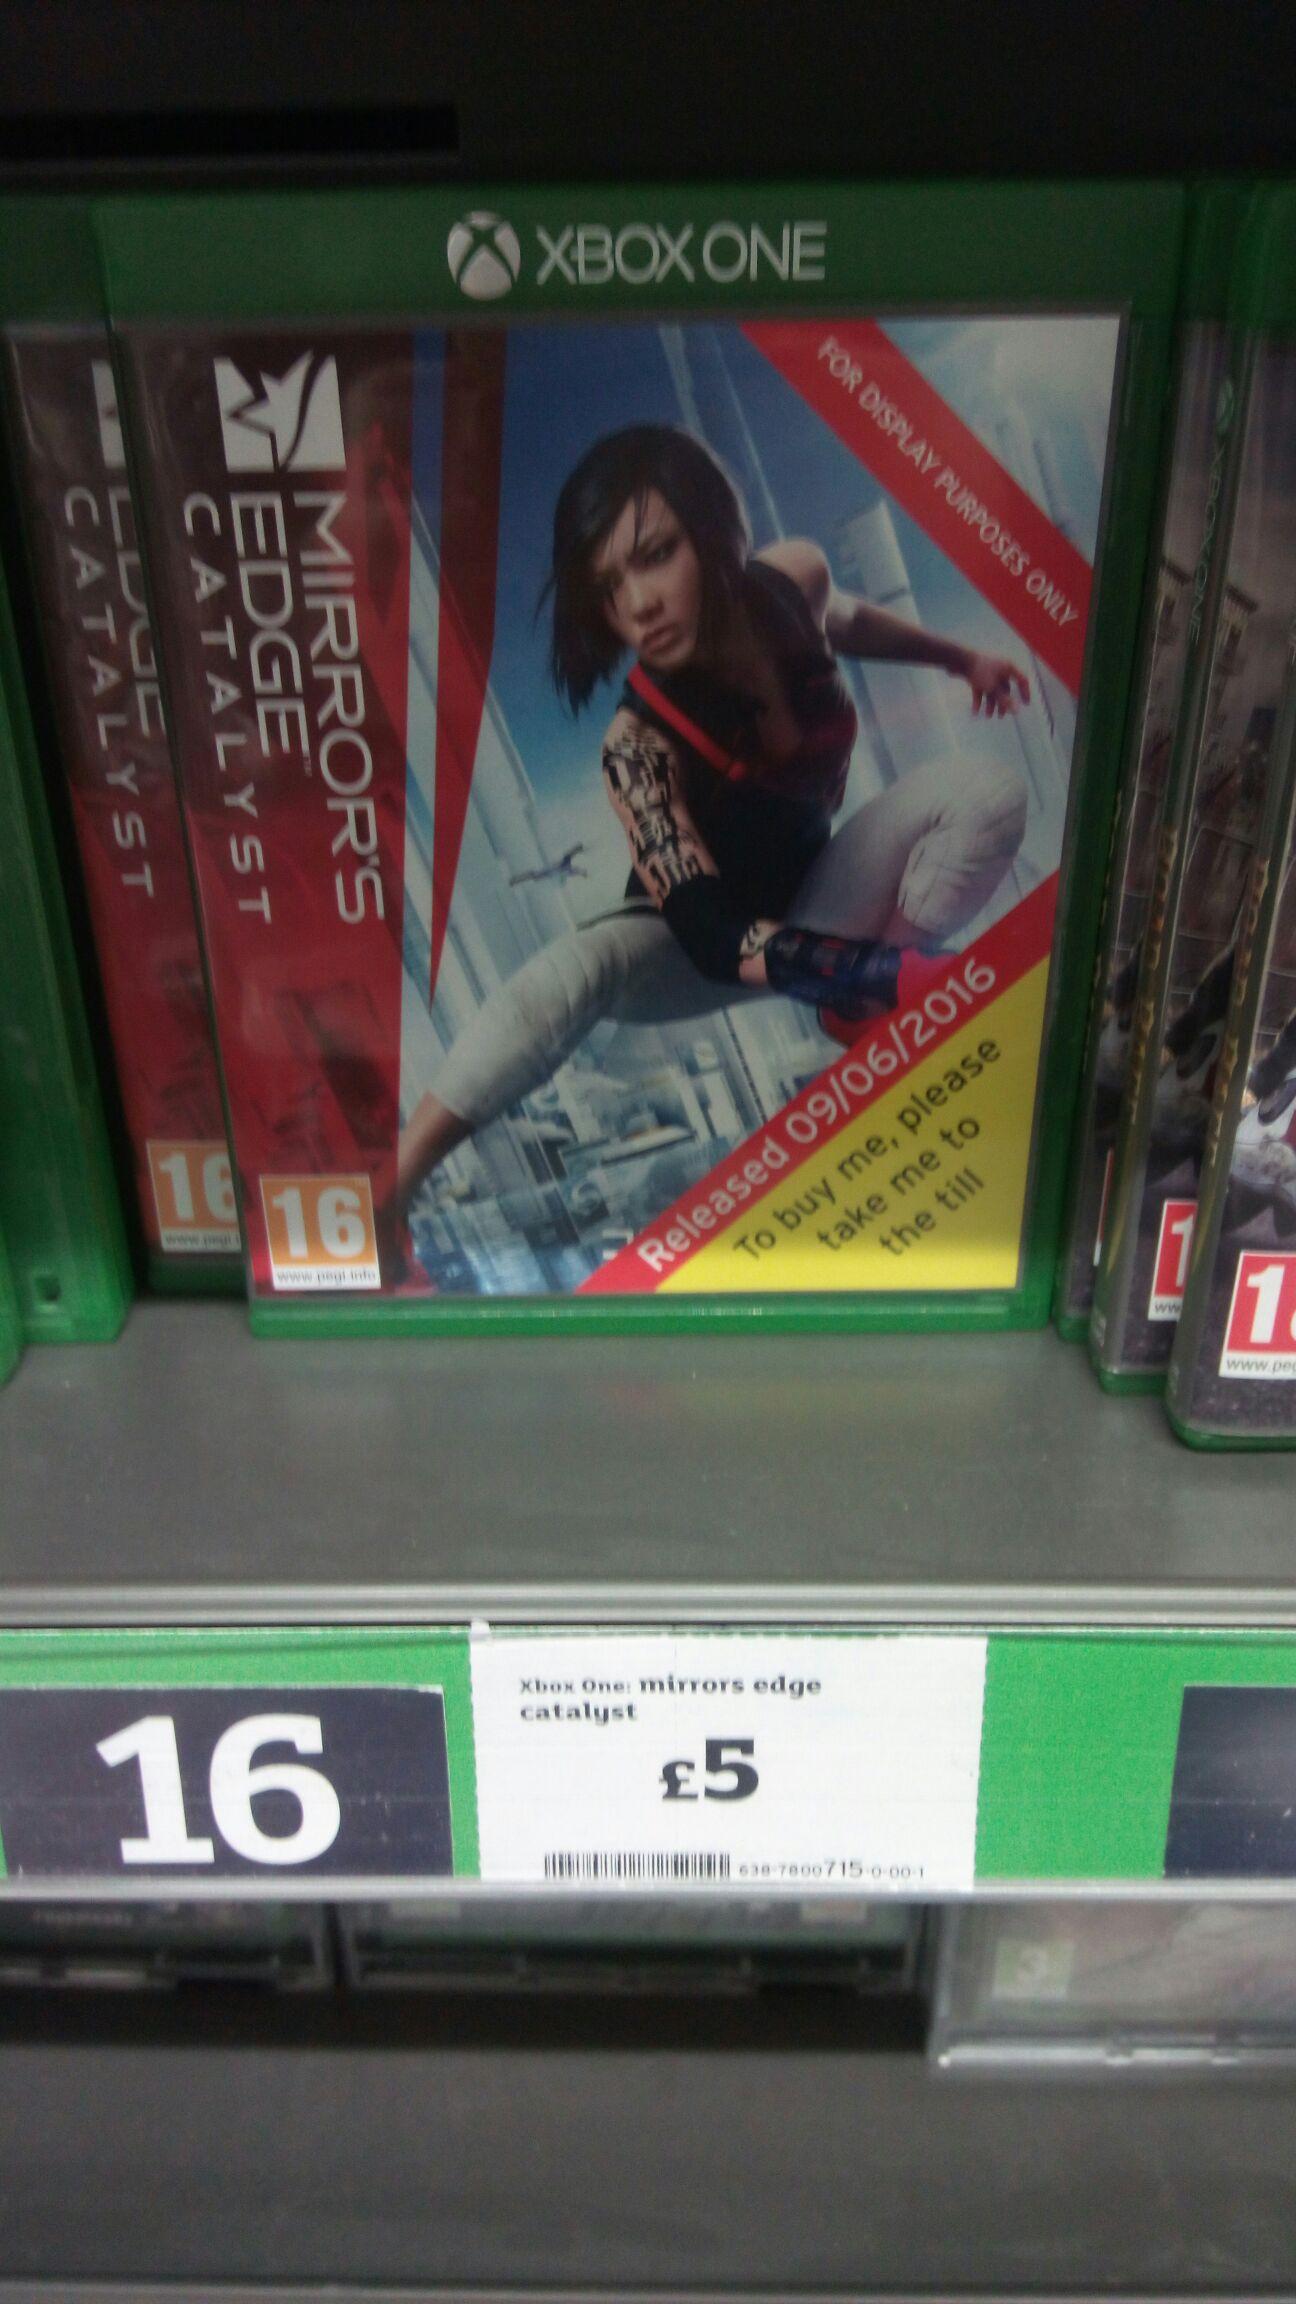 mirror edge catalyst on xboxone £5 @ Sainsburys